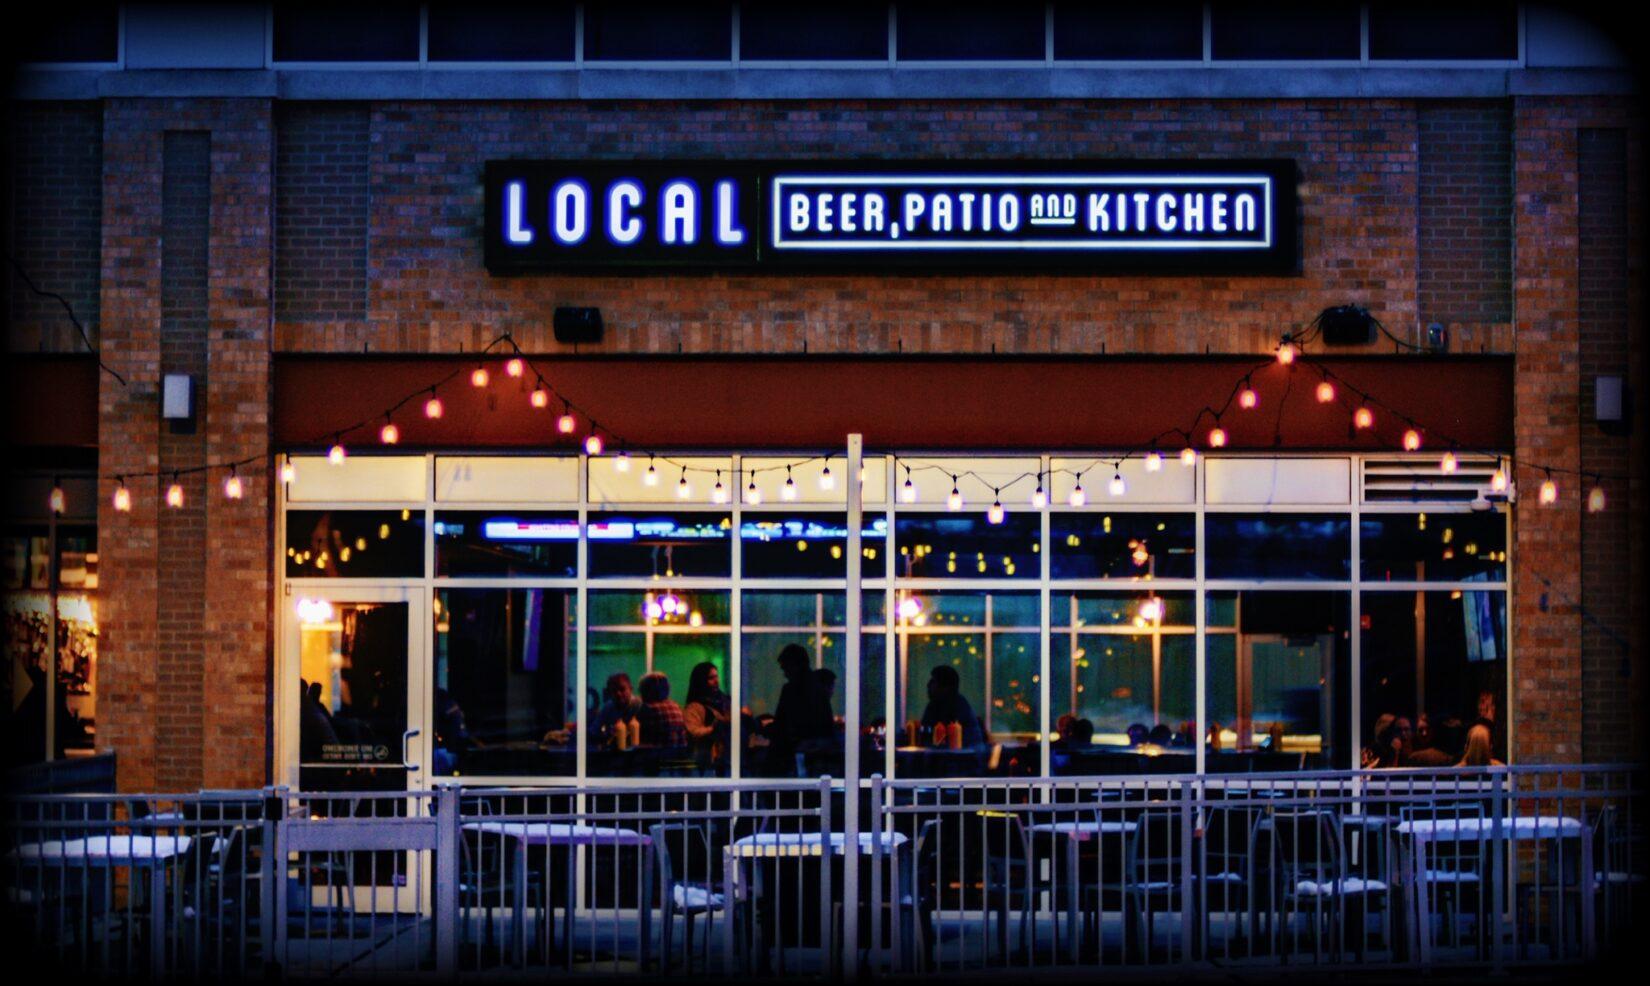 Market lighting on restaurant patio